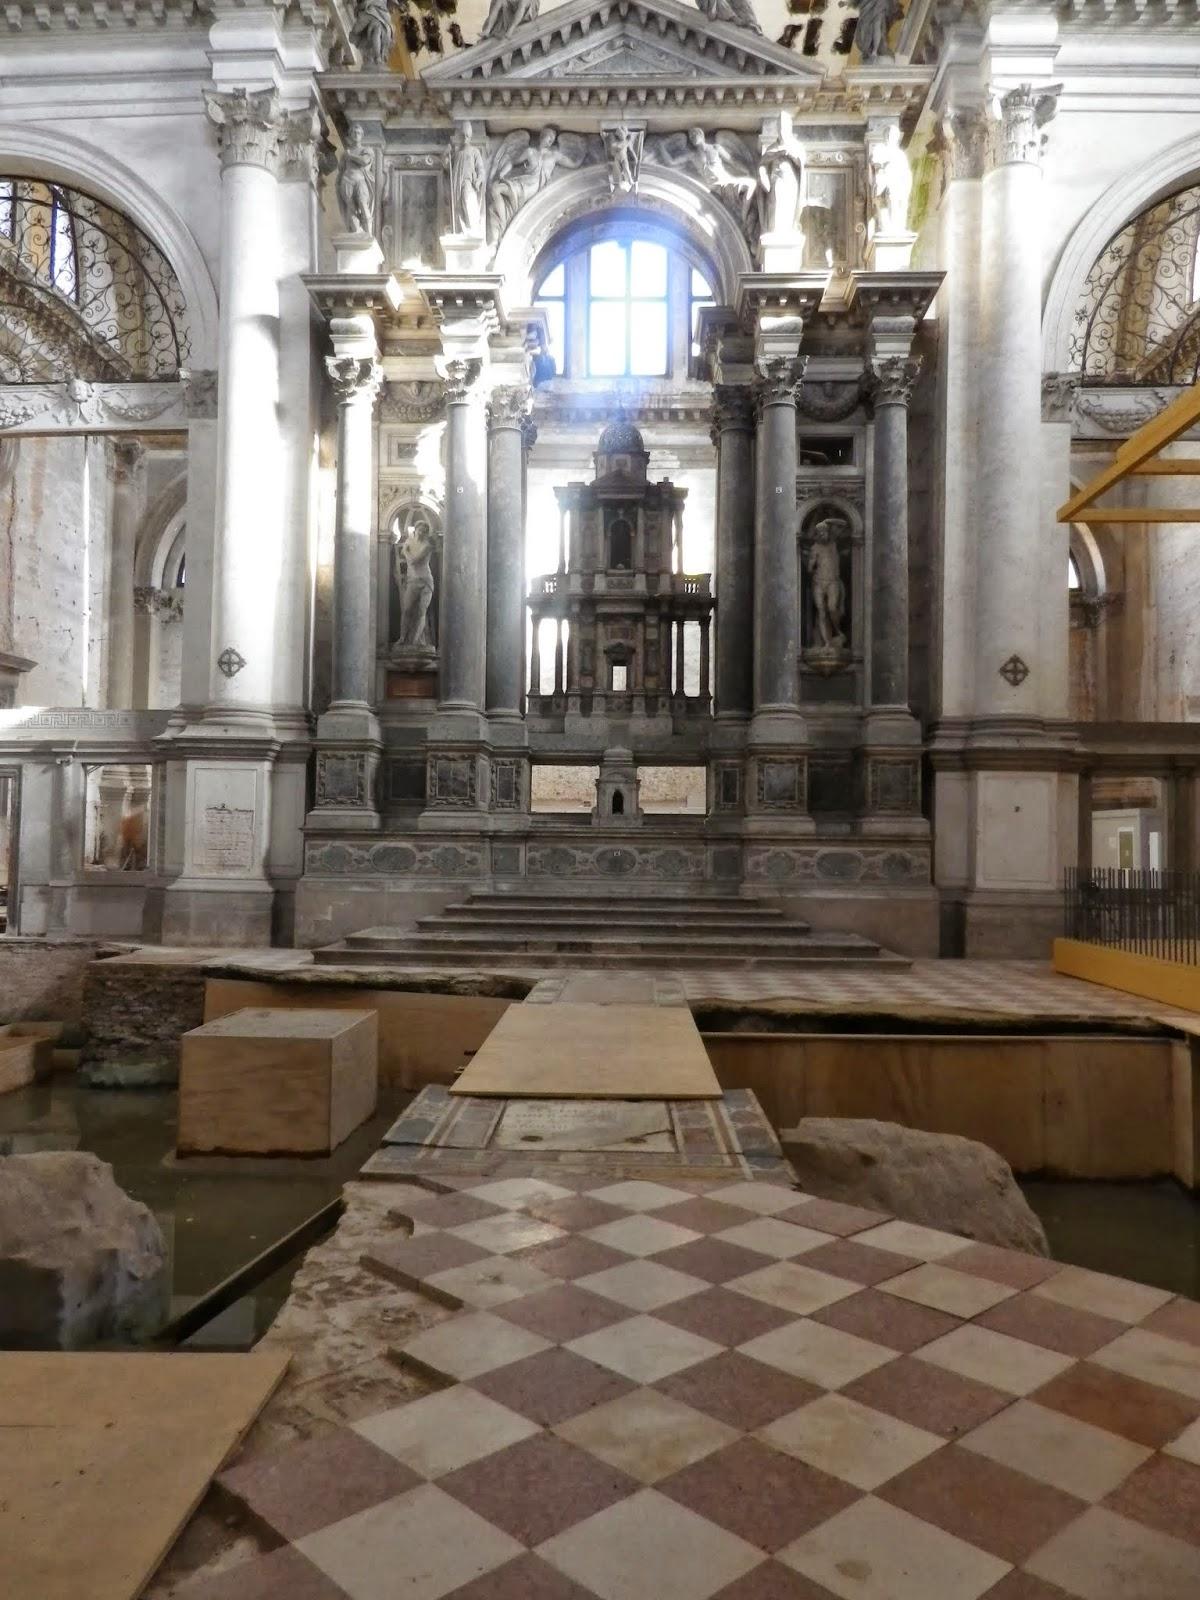 The interior of the church of San Lorenzo, Venice